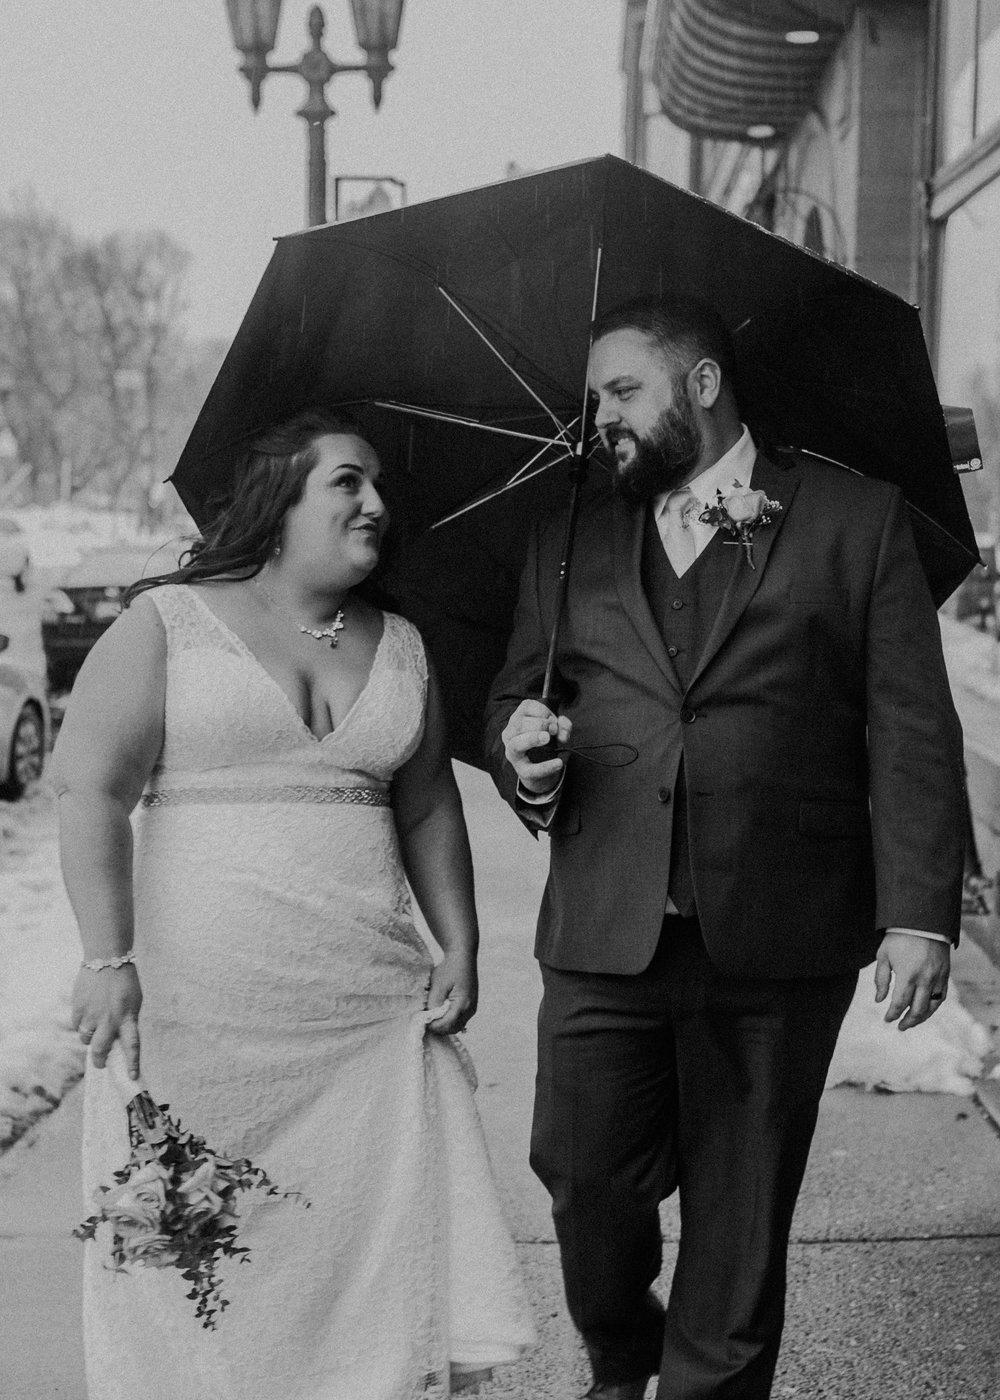 Intimate_Wedding_St_Paul_MN_WA_Frost_Sweeneys_Andrea_Wagner_Photography (79 of 99).jpg